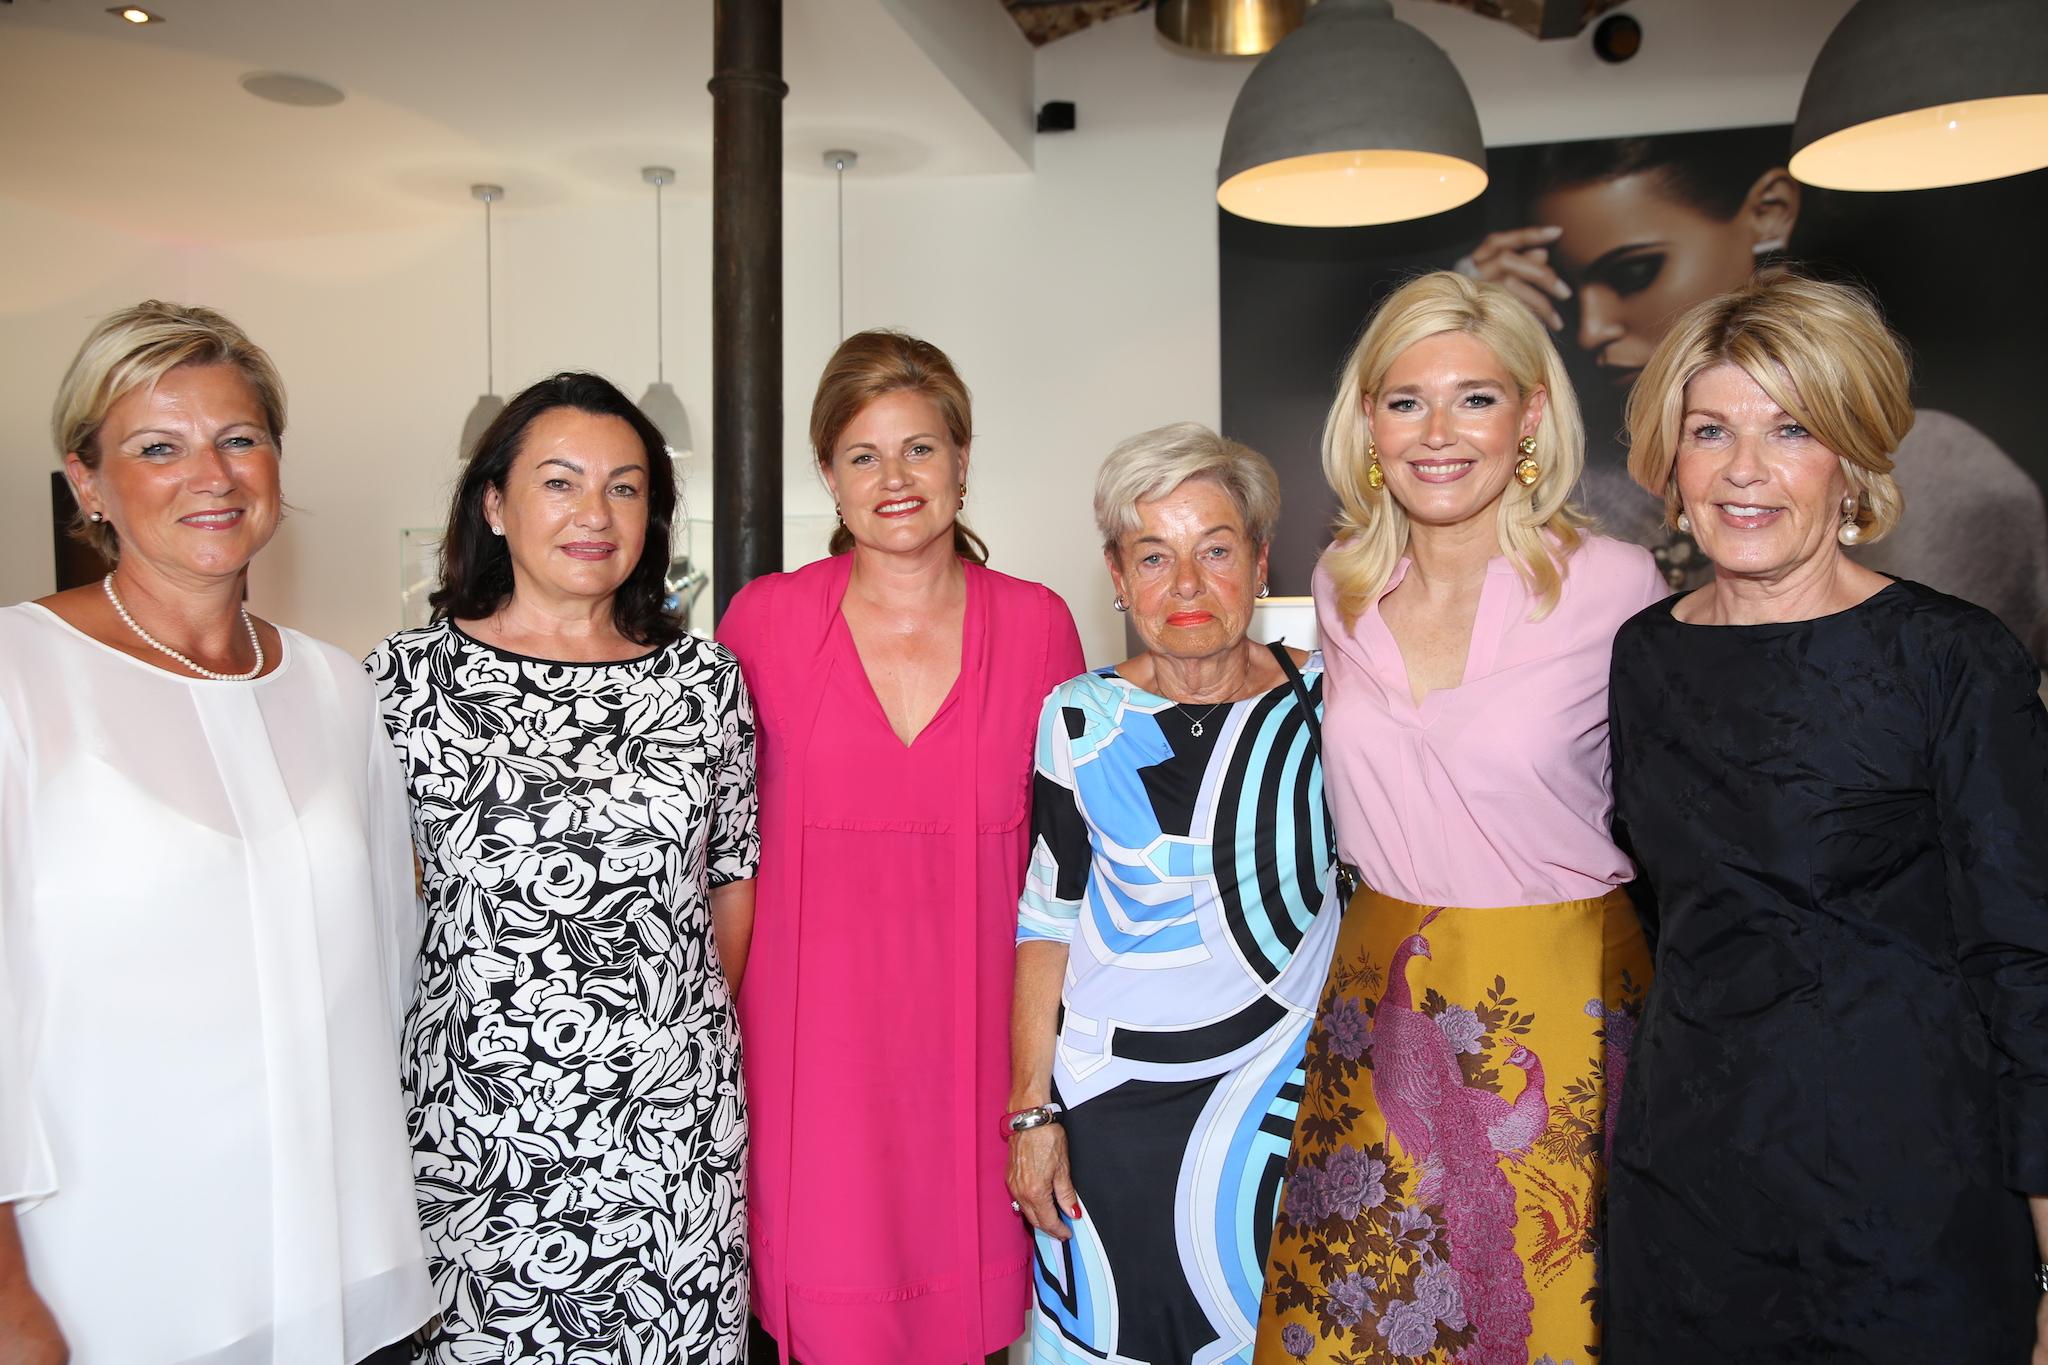 Brauksiepe Goldschmiedemanufaktur, Birgit Weber, Angelika Bredemeier, Andrea Widmann, Monika Schlünder, Petra Dieners, Beatrix Hammerschmidt, Lifestyle-Blog, Lieblingsstil.com,